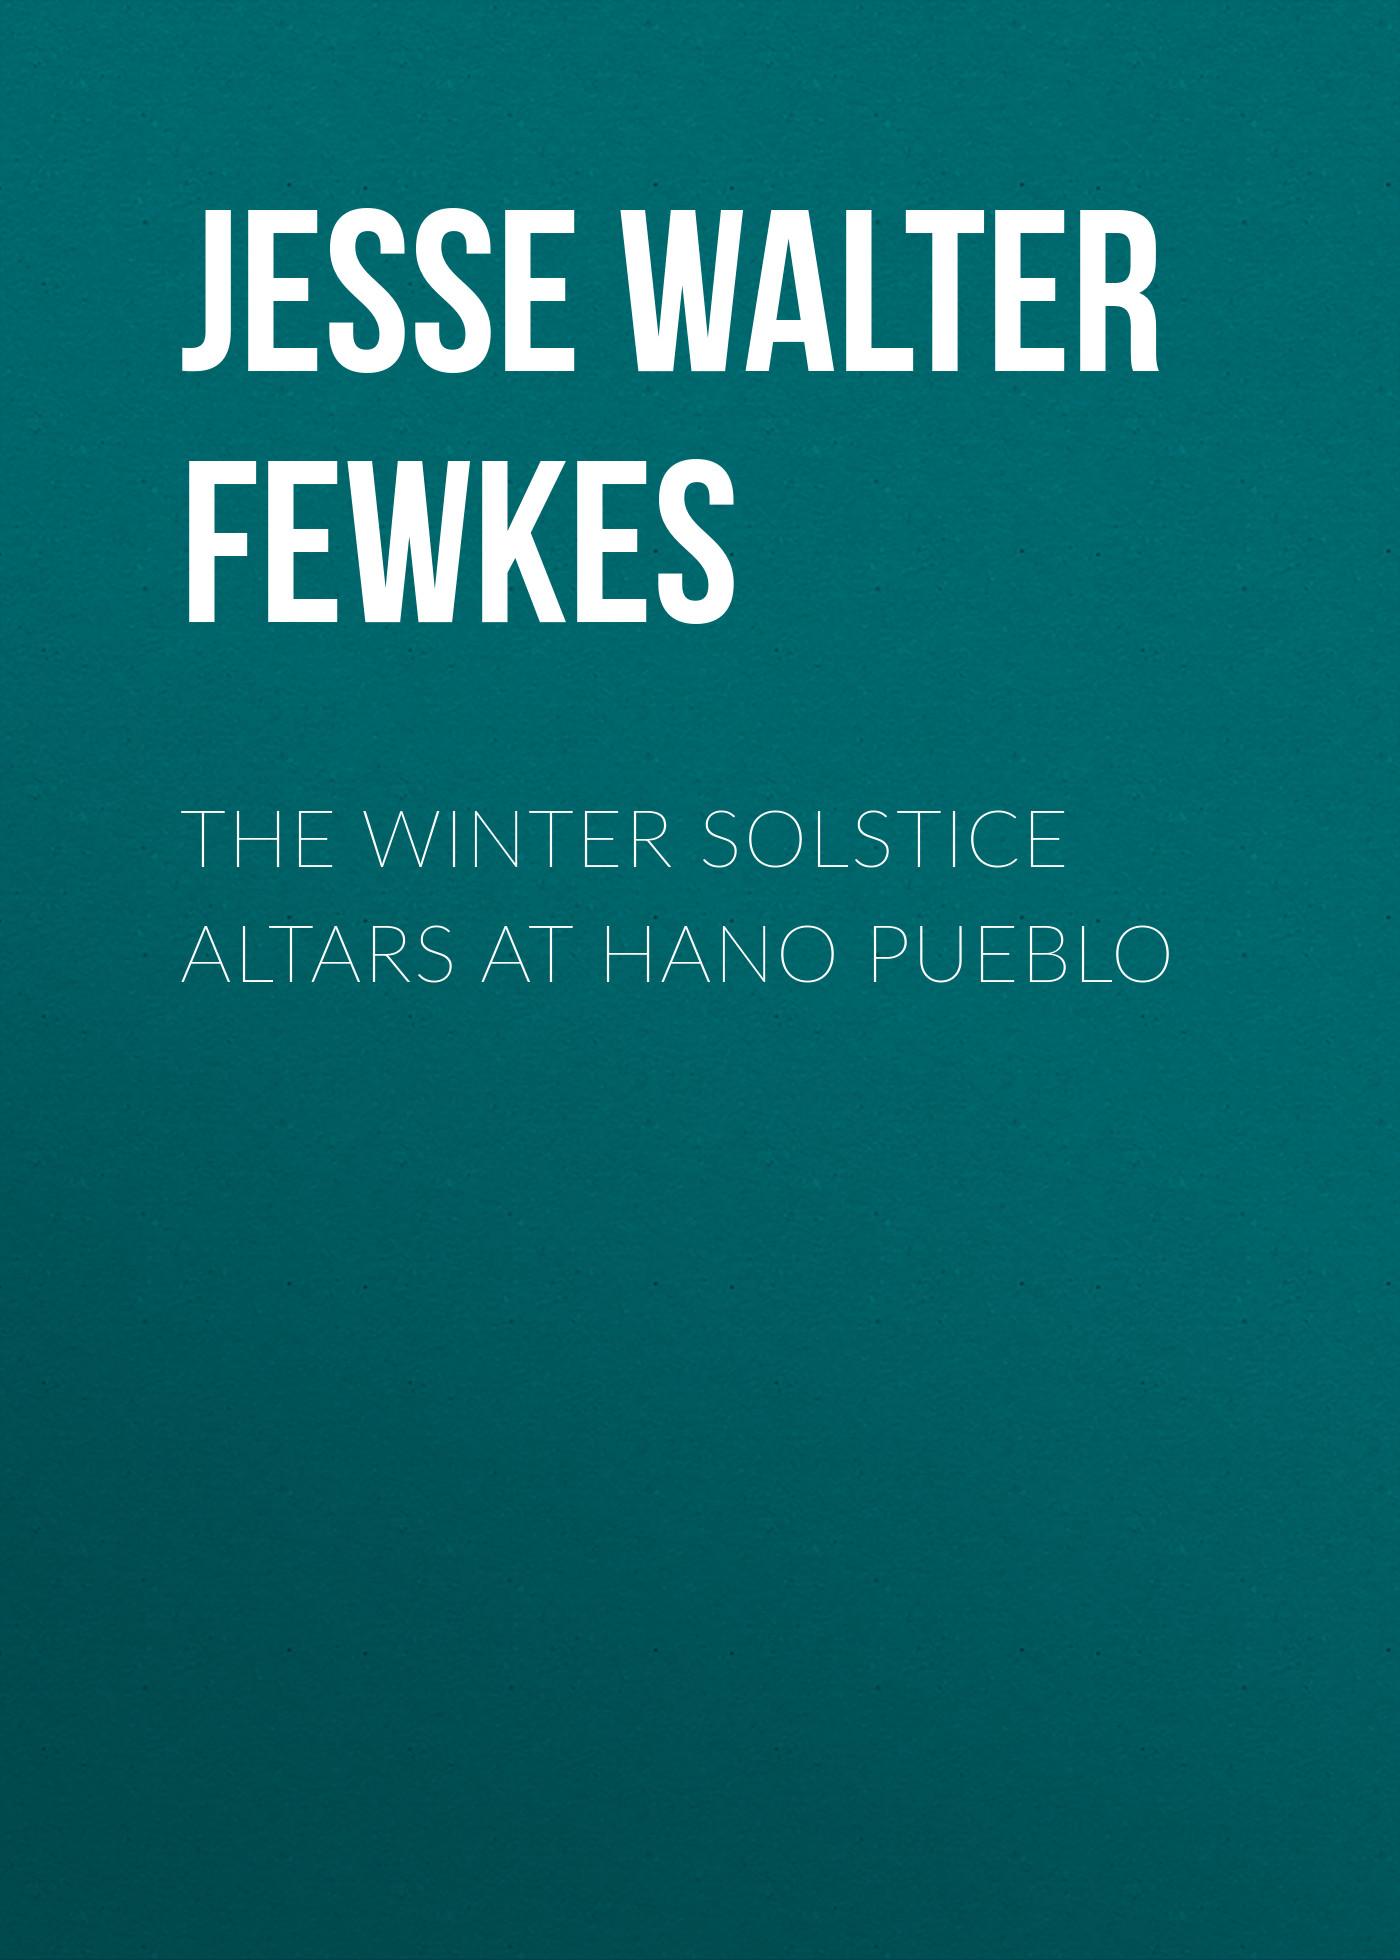 Jesse Walter Fewkes The Winter Solstice Altars at Hano Pueblo jesse walter fewkes the winter solstice altars at hano pueblo